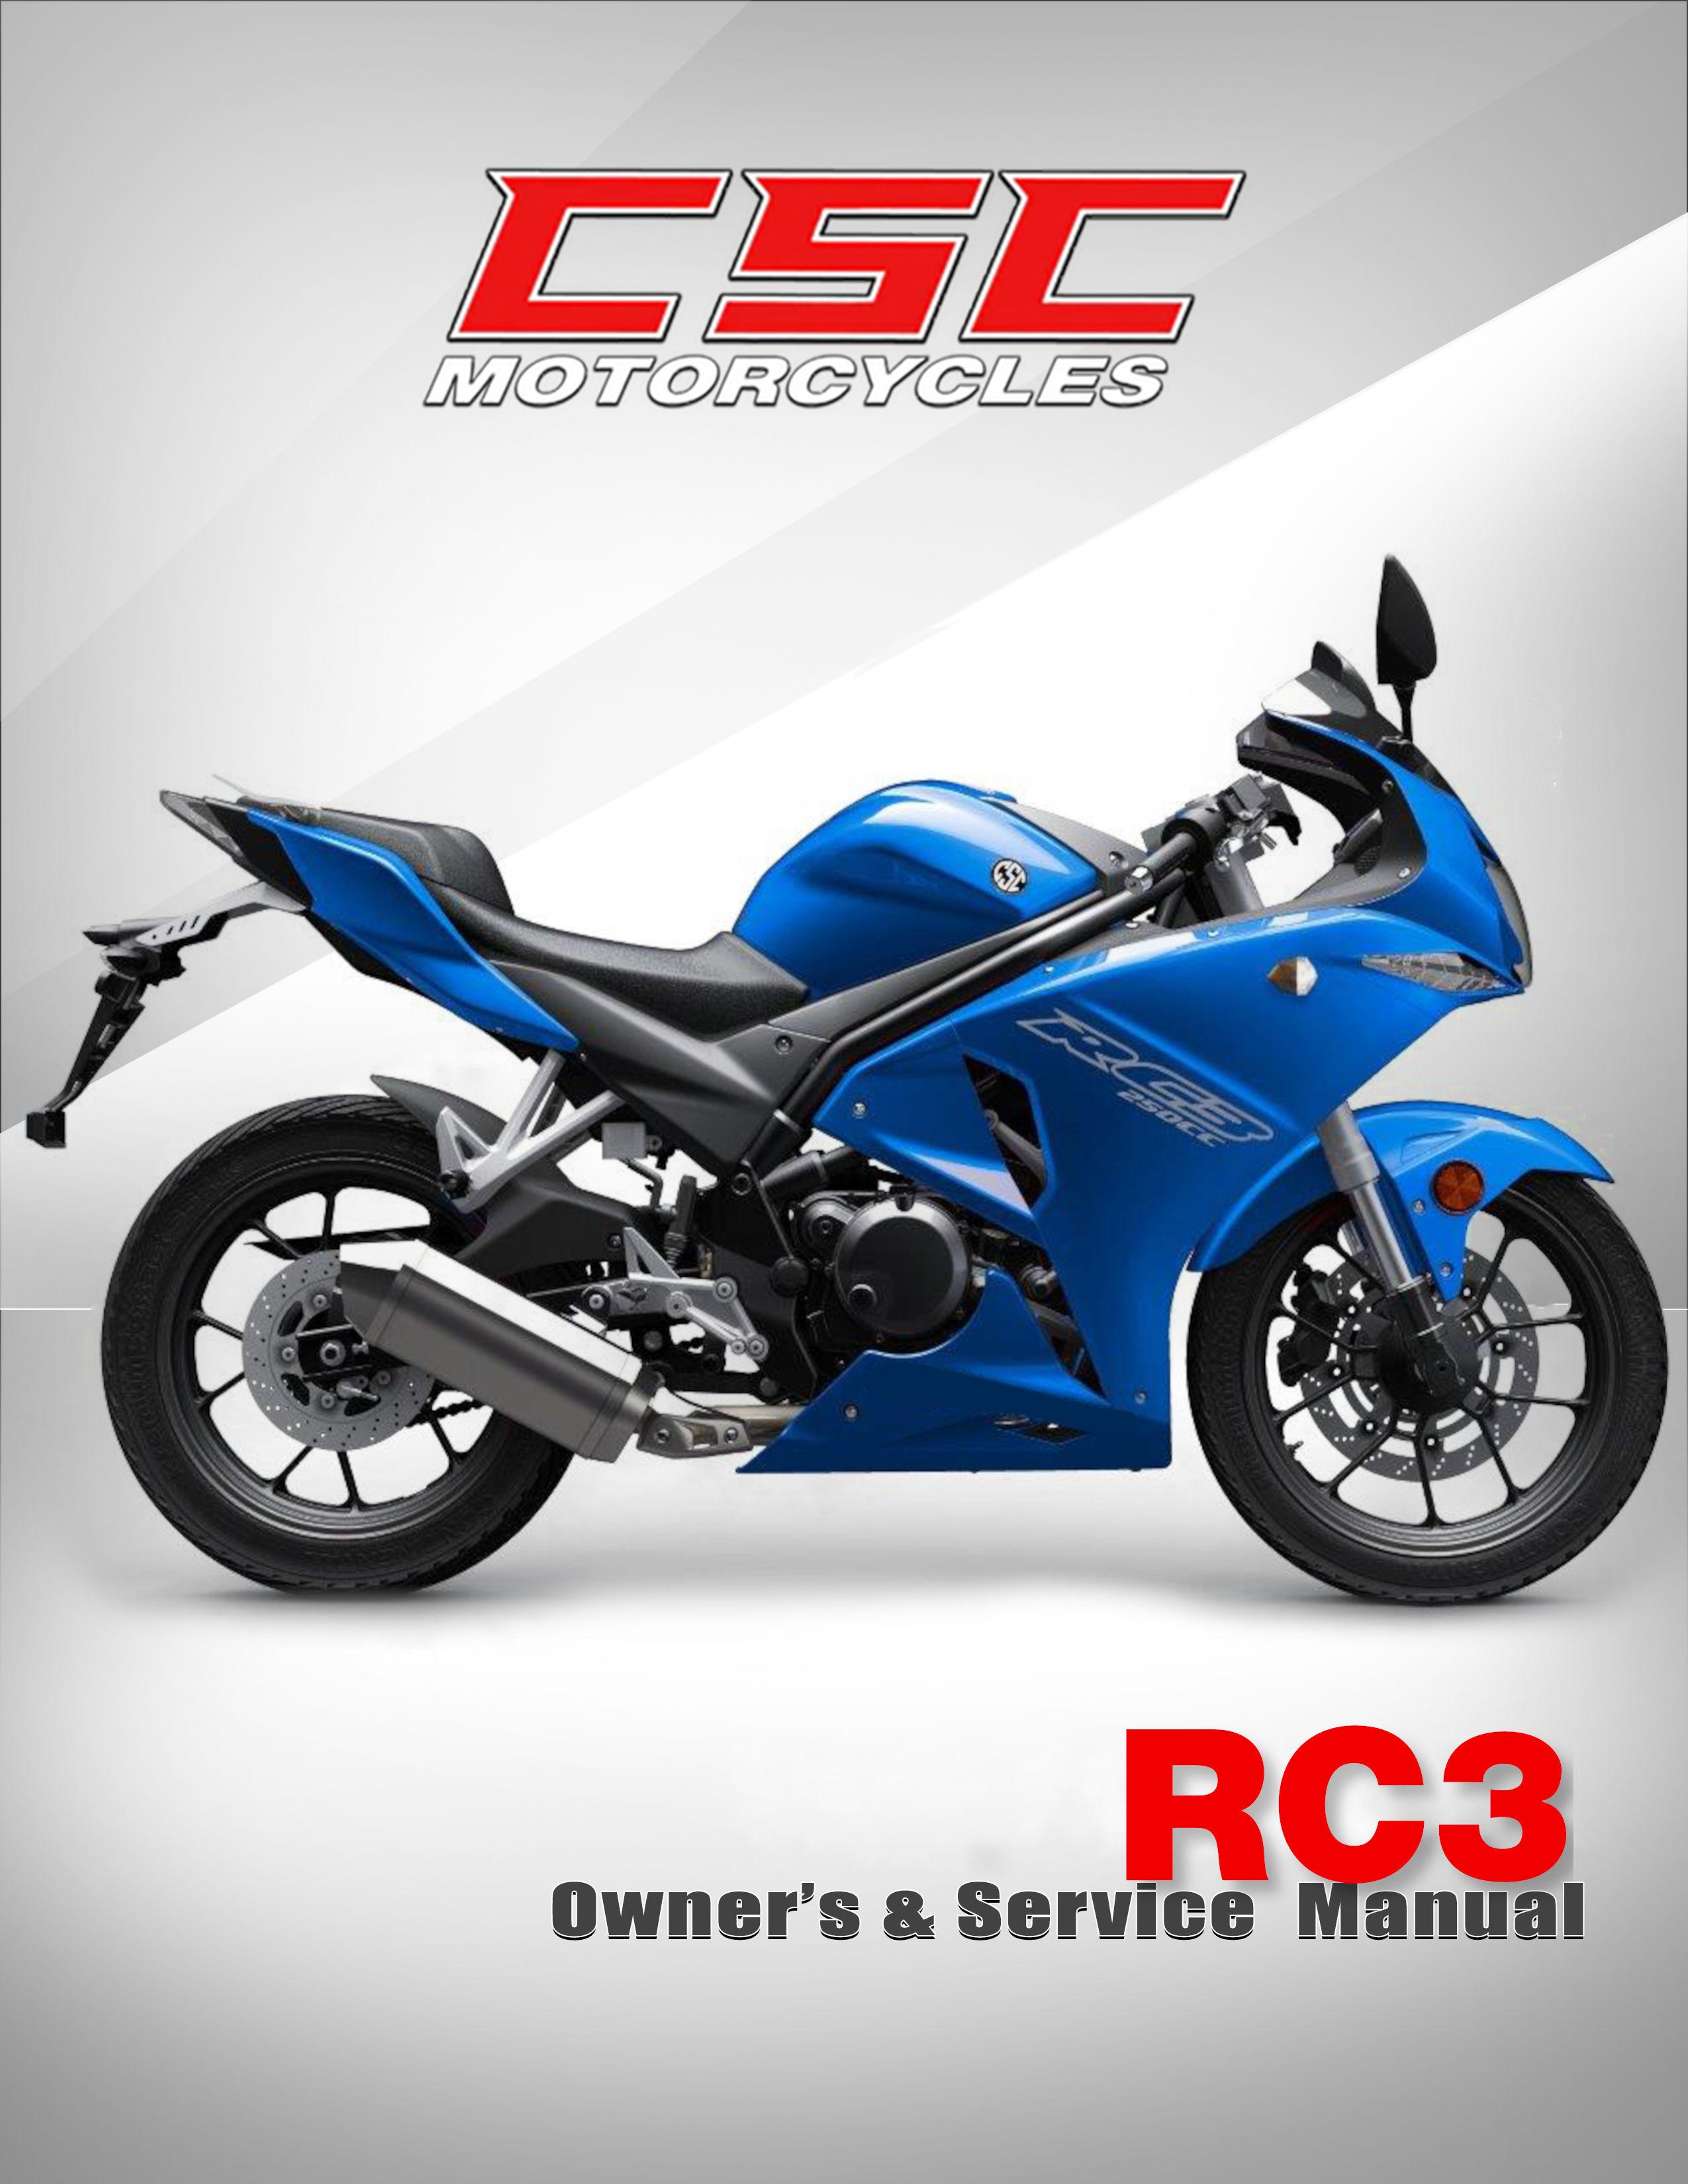 RC3_ManualCover.jpg